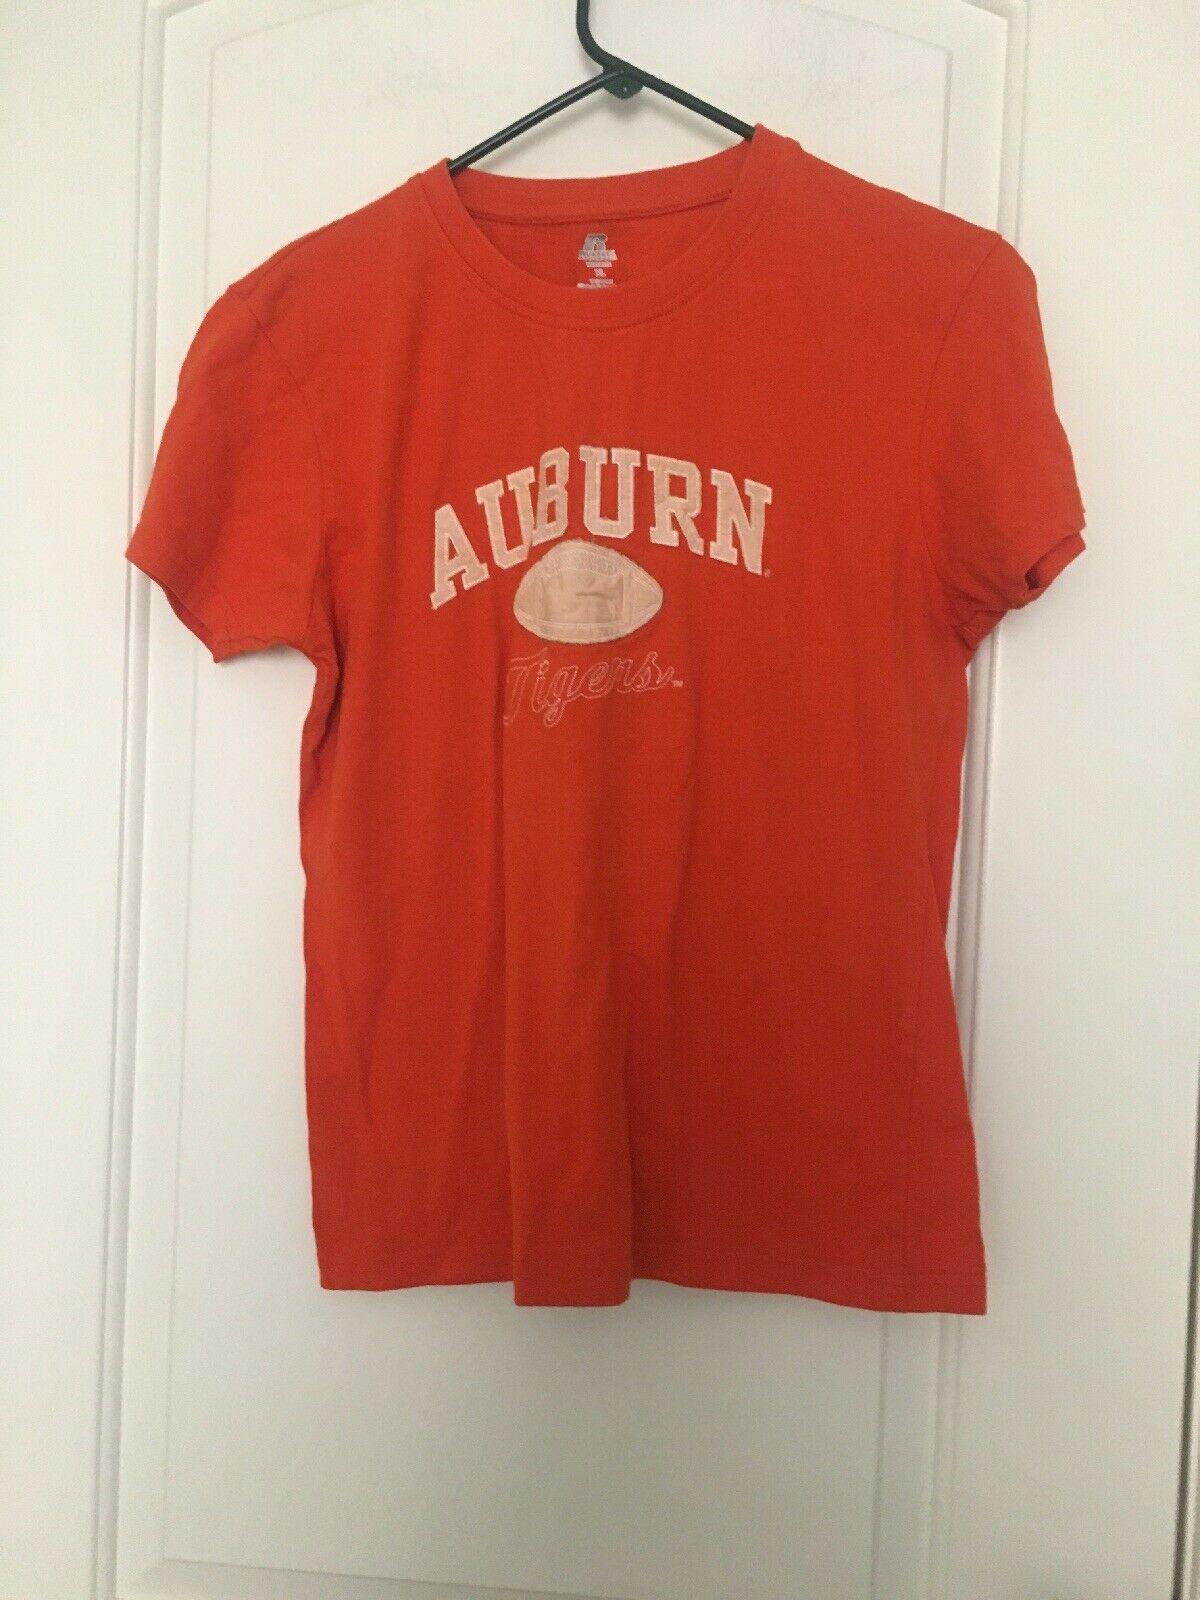 Russell Athletic AUBURN Tigers NCAA Women's Short Sleeve T-Shirt Sz XL Shirt - $30.96